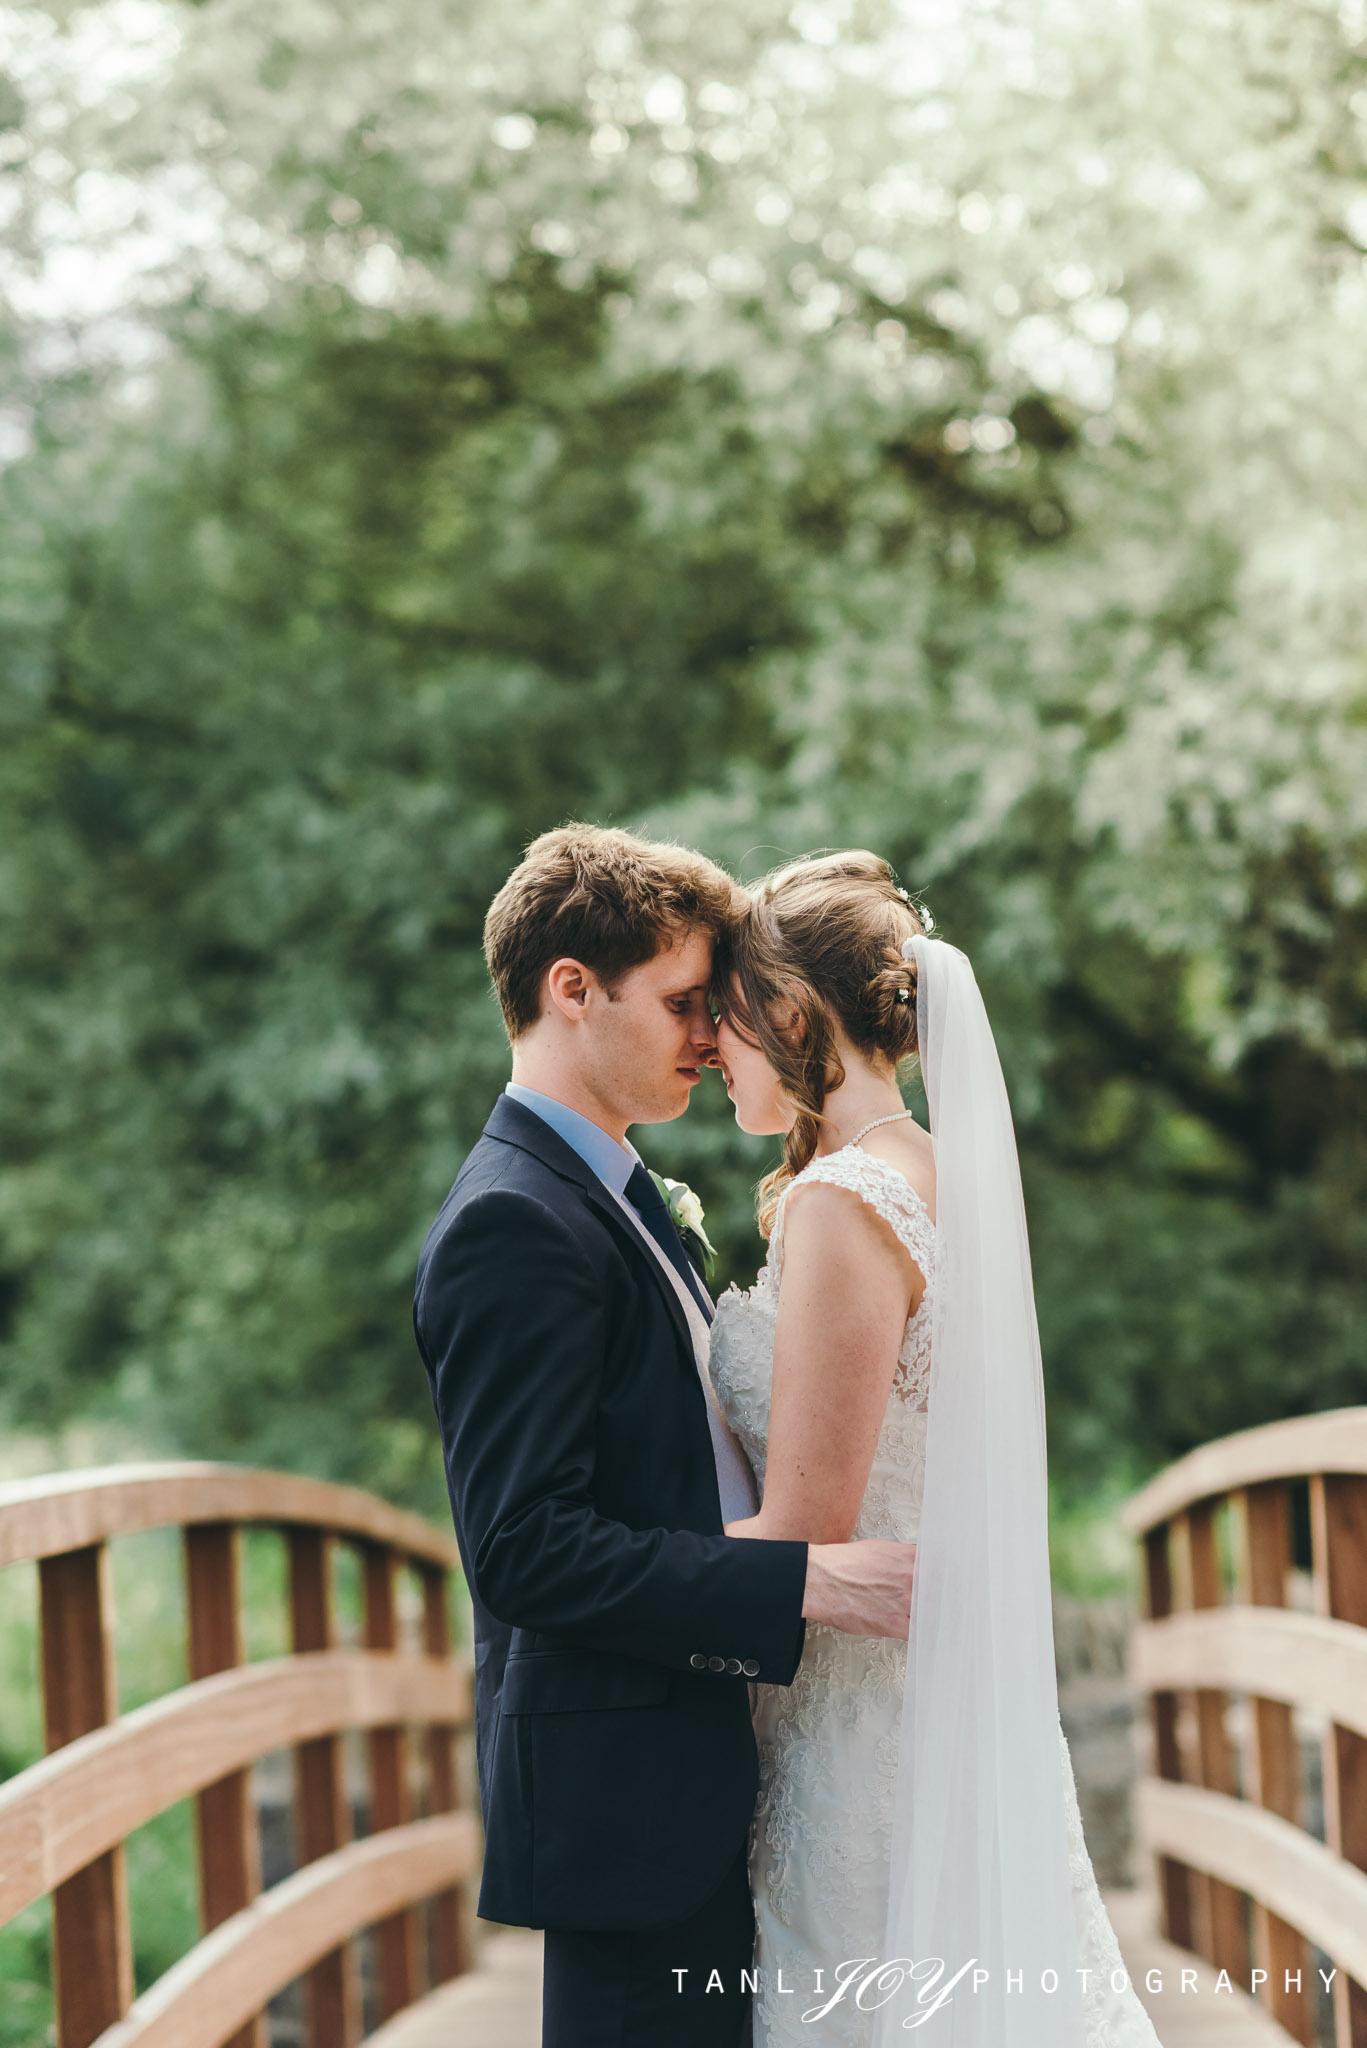 Swan Hotel Bibury Wedding Cirencester Photographer